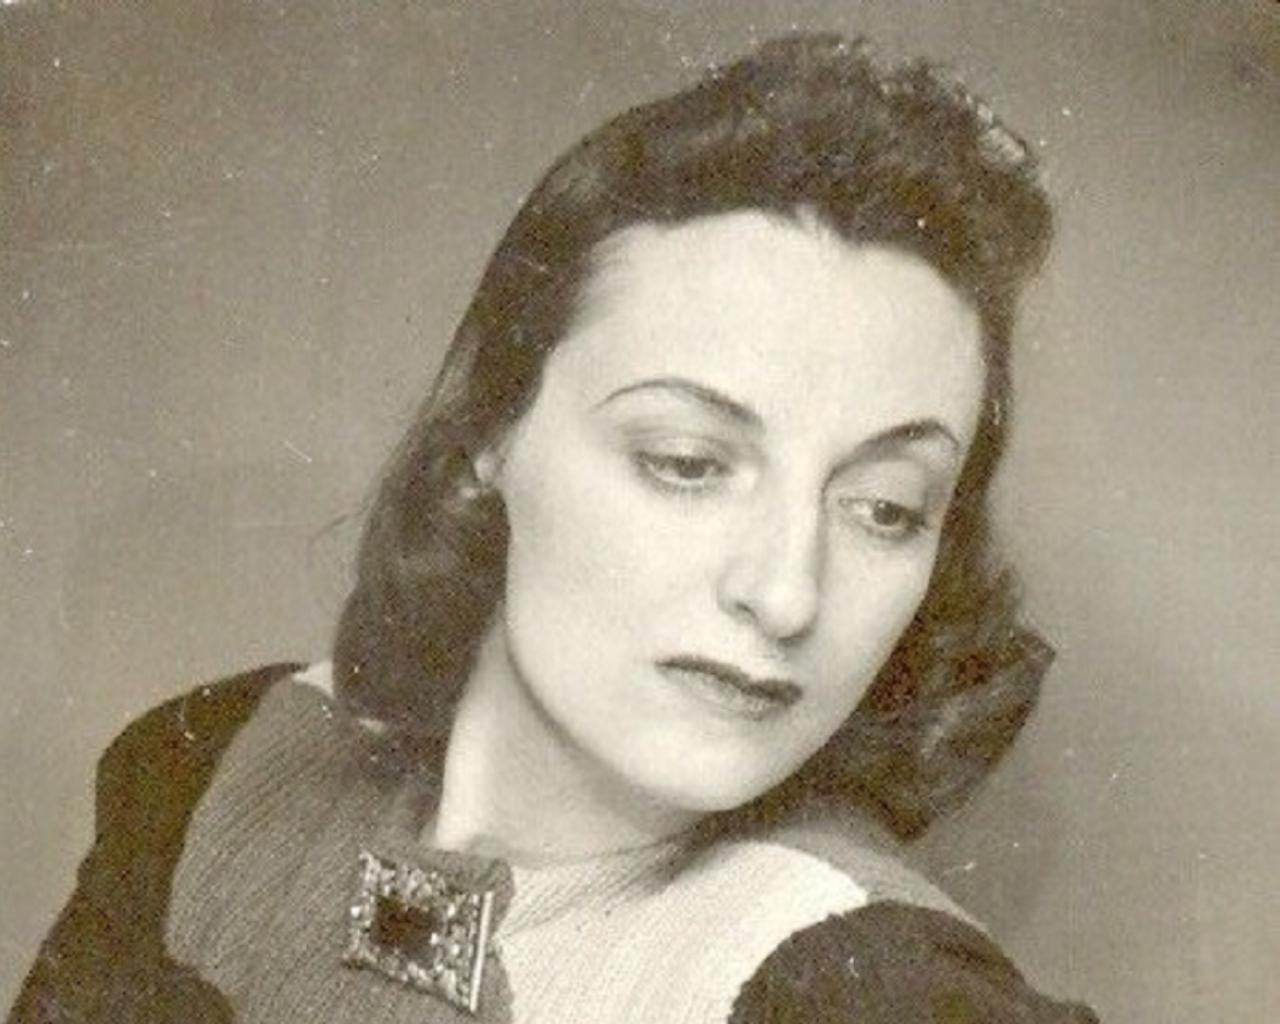 Homenaje rescató figura y legado de Pepita Turina